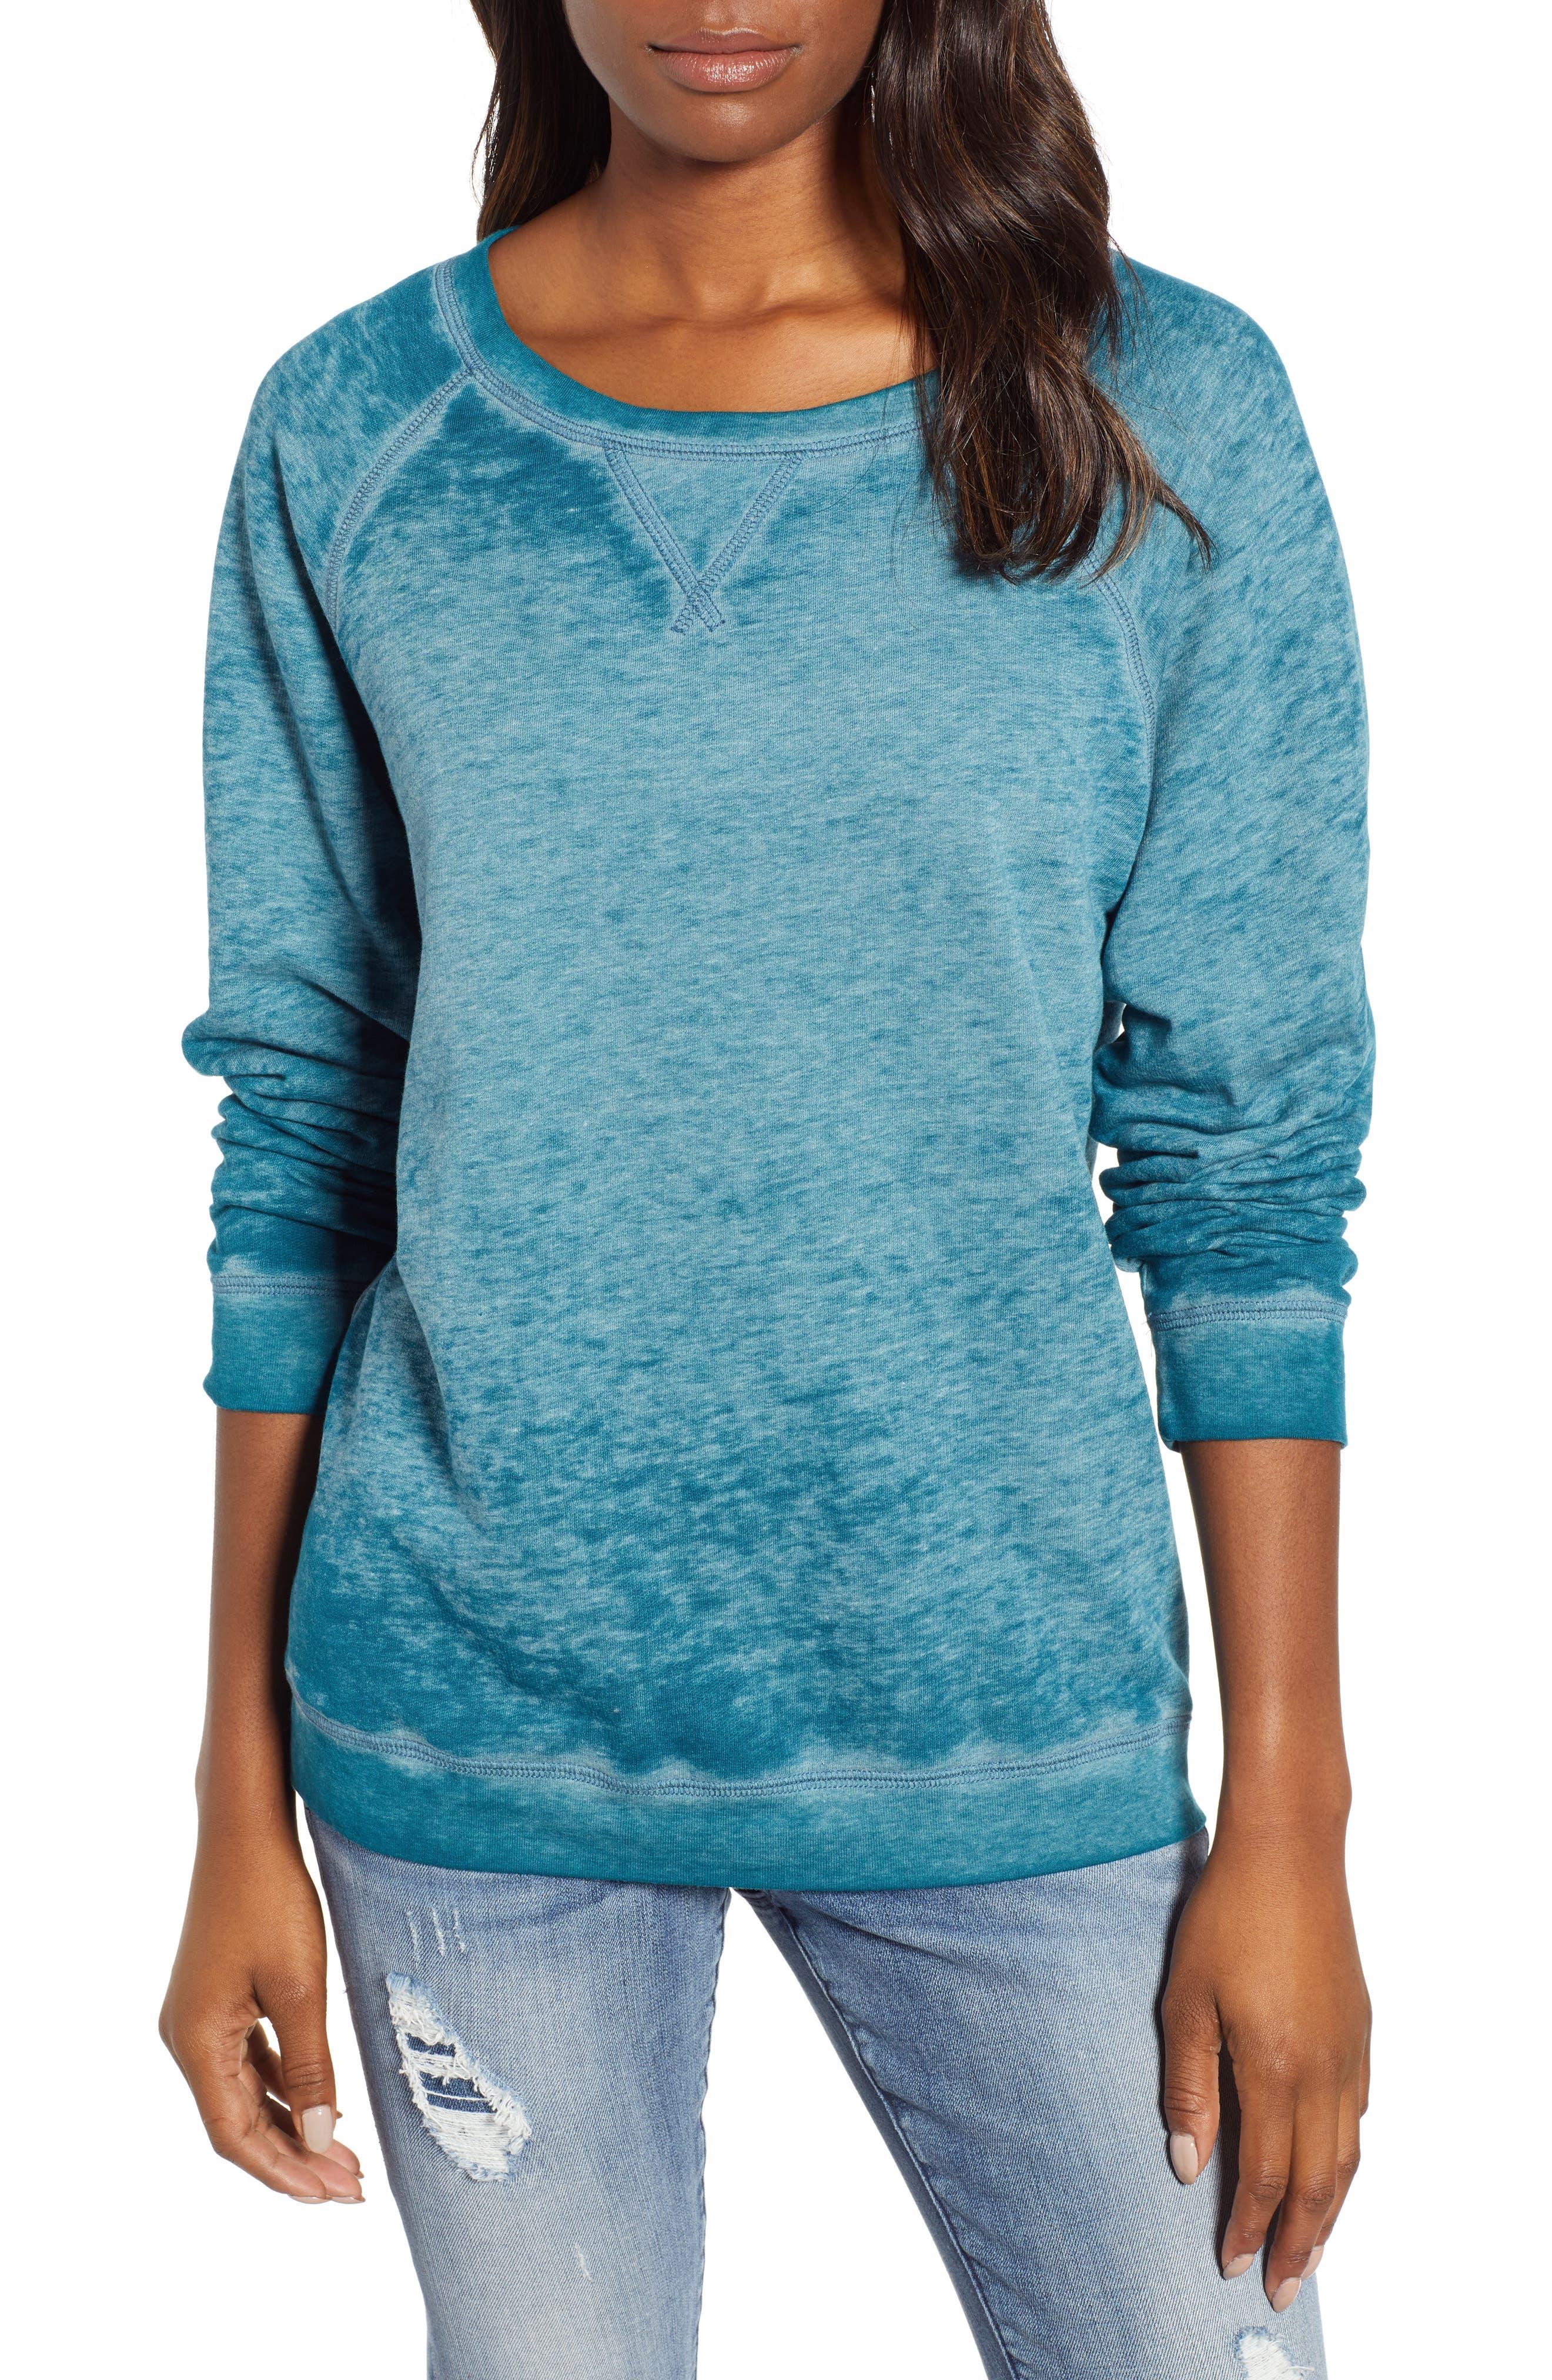 Burnout Sweatshirt,                         Main,                         color, TEAL CORAL